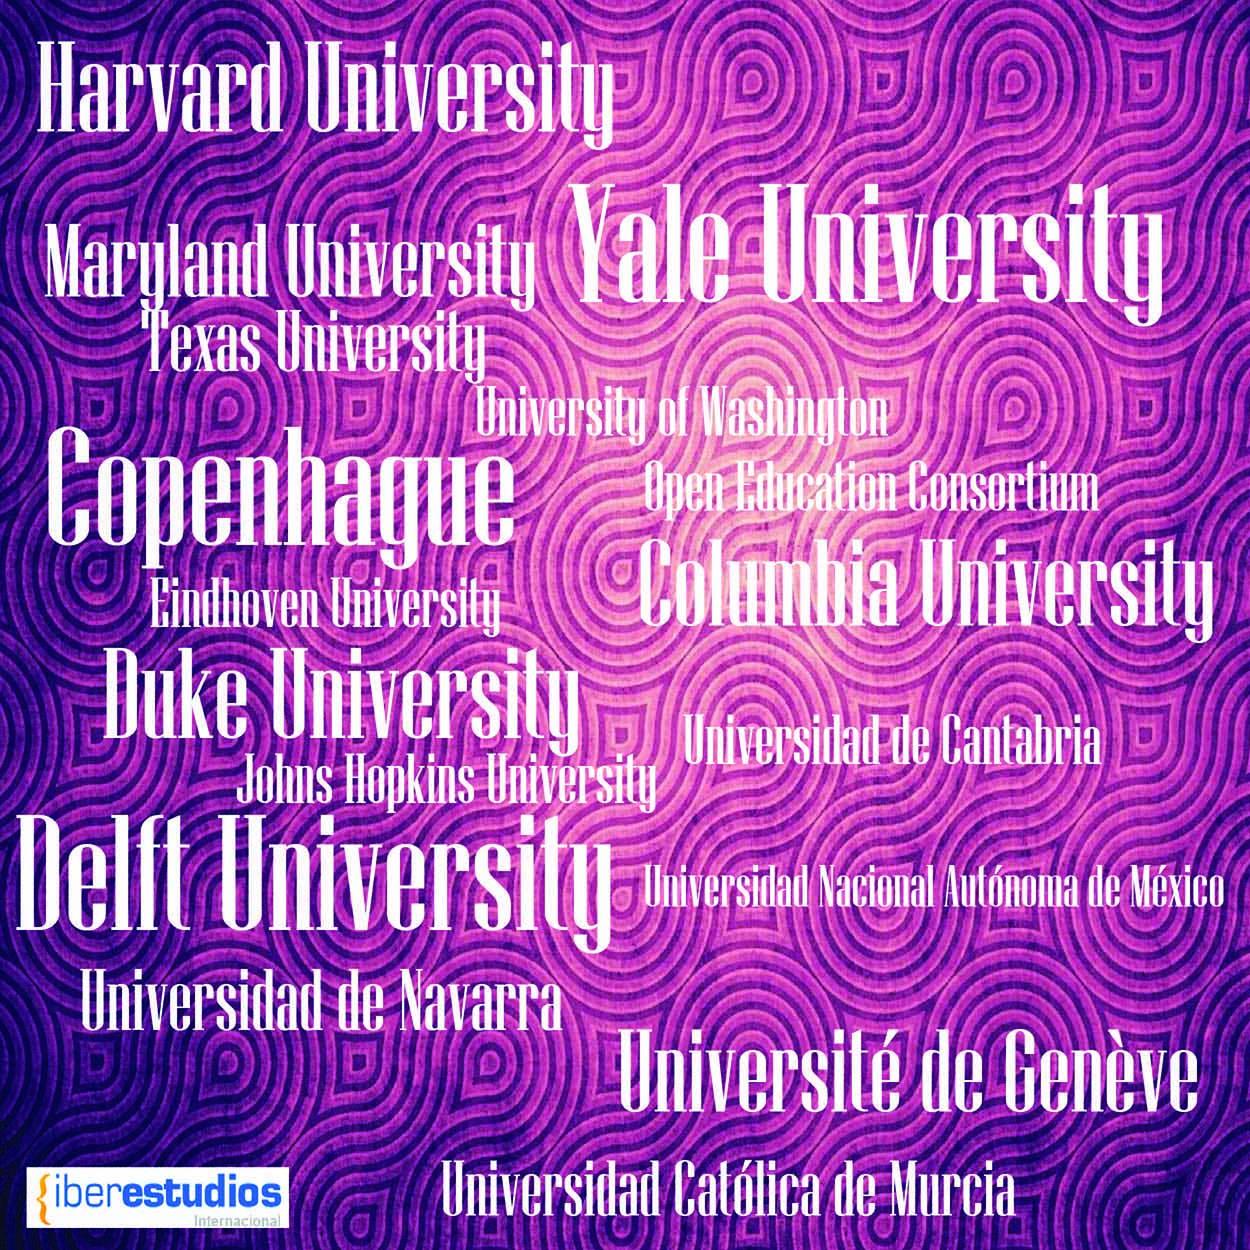 Universidades Iberestudios